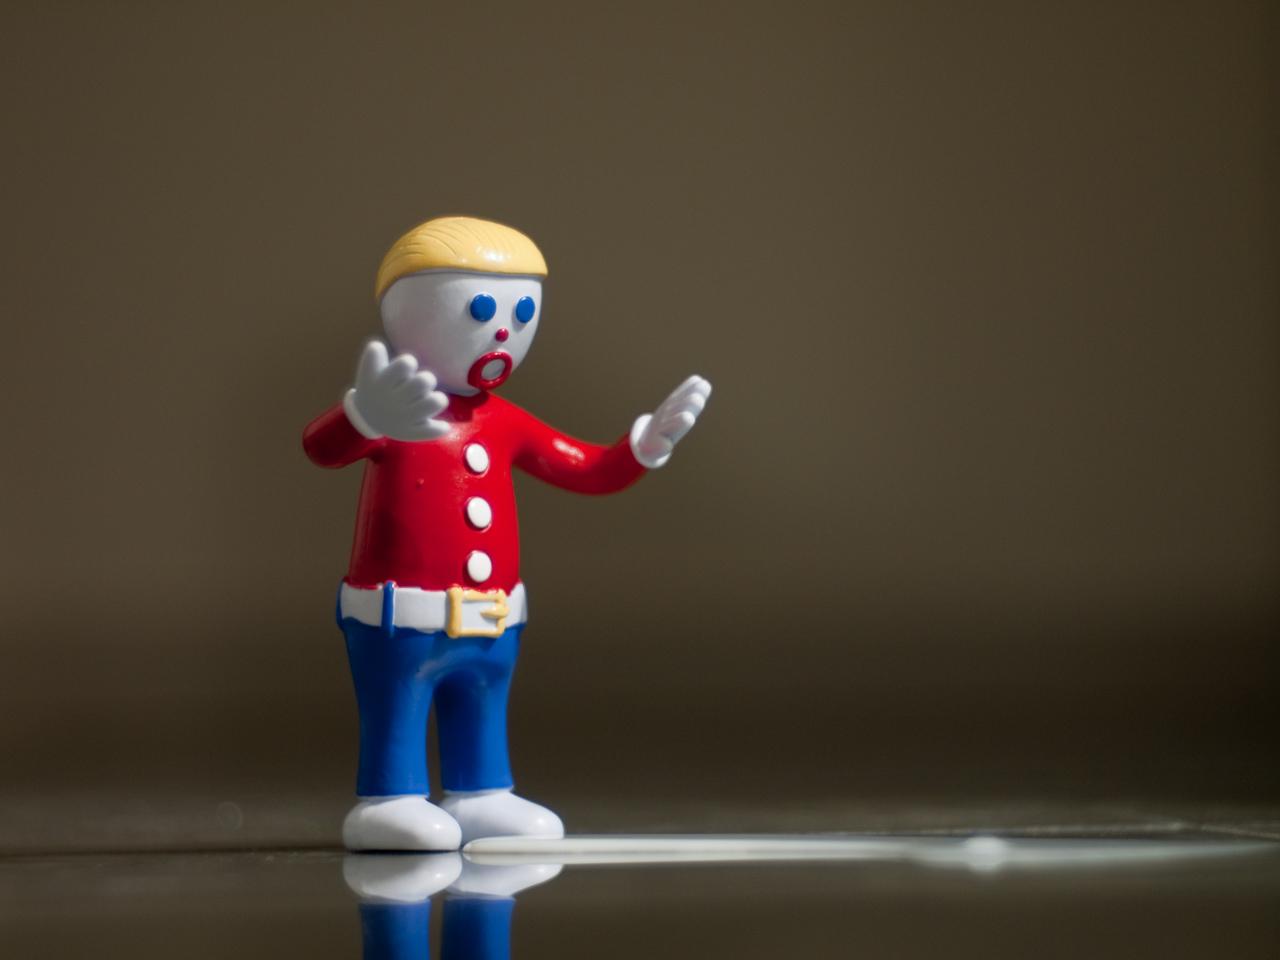 Oh no! Mr. Bill! - photo by phobus